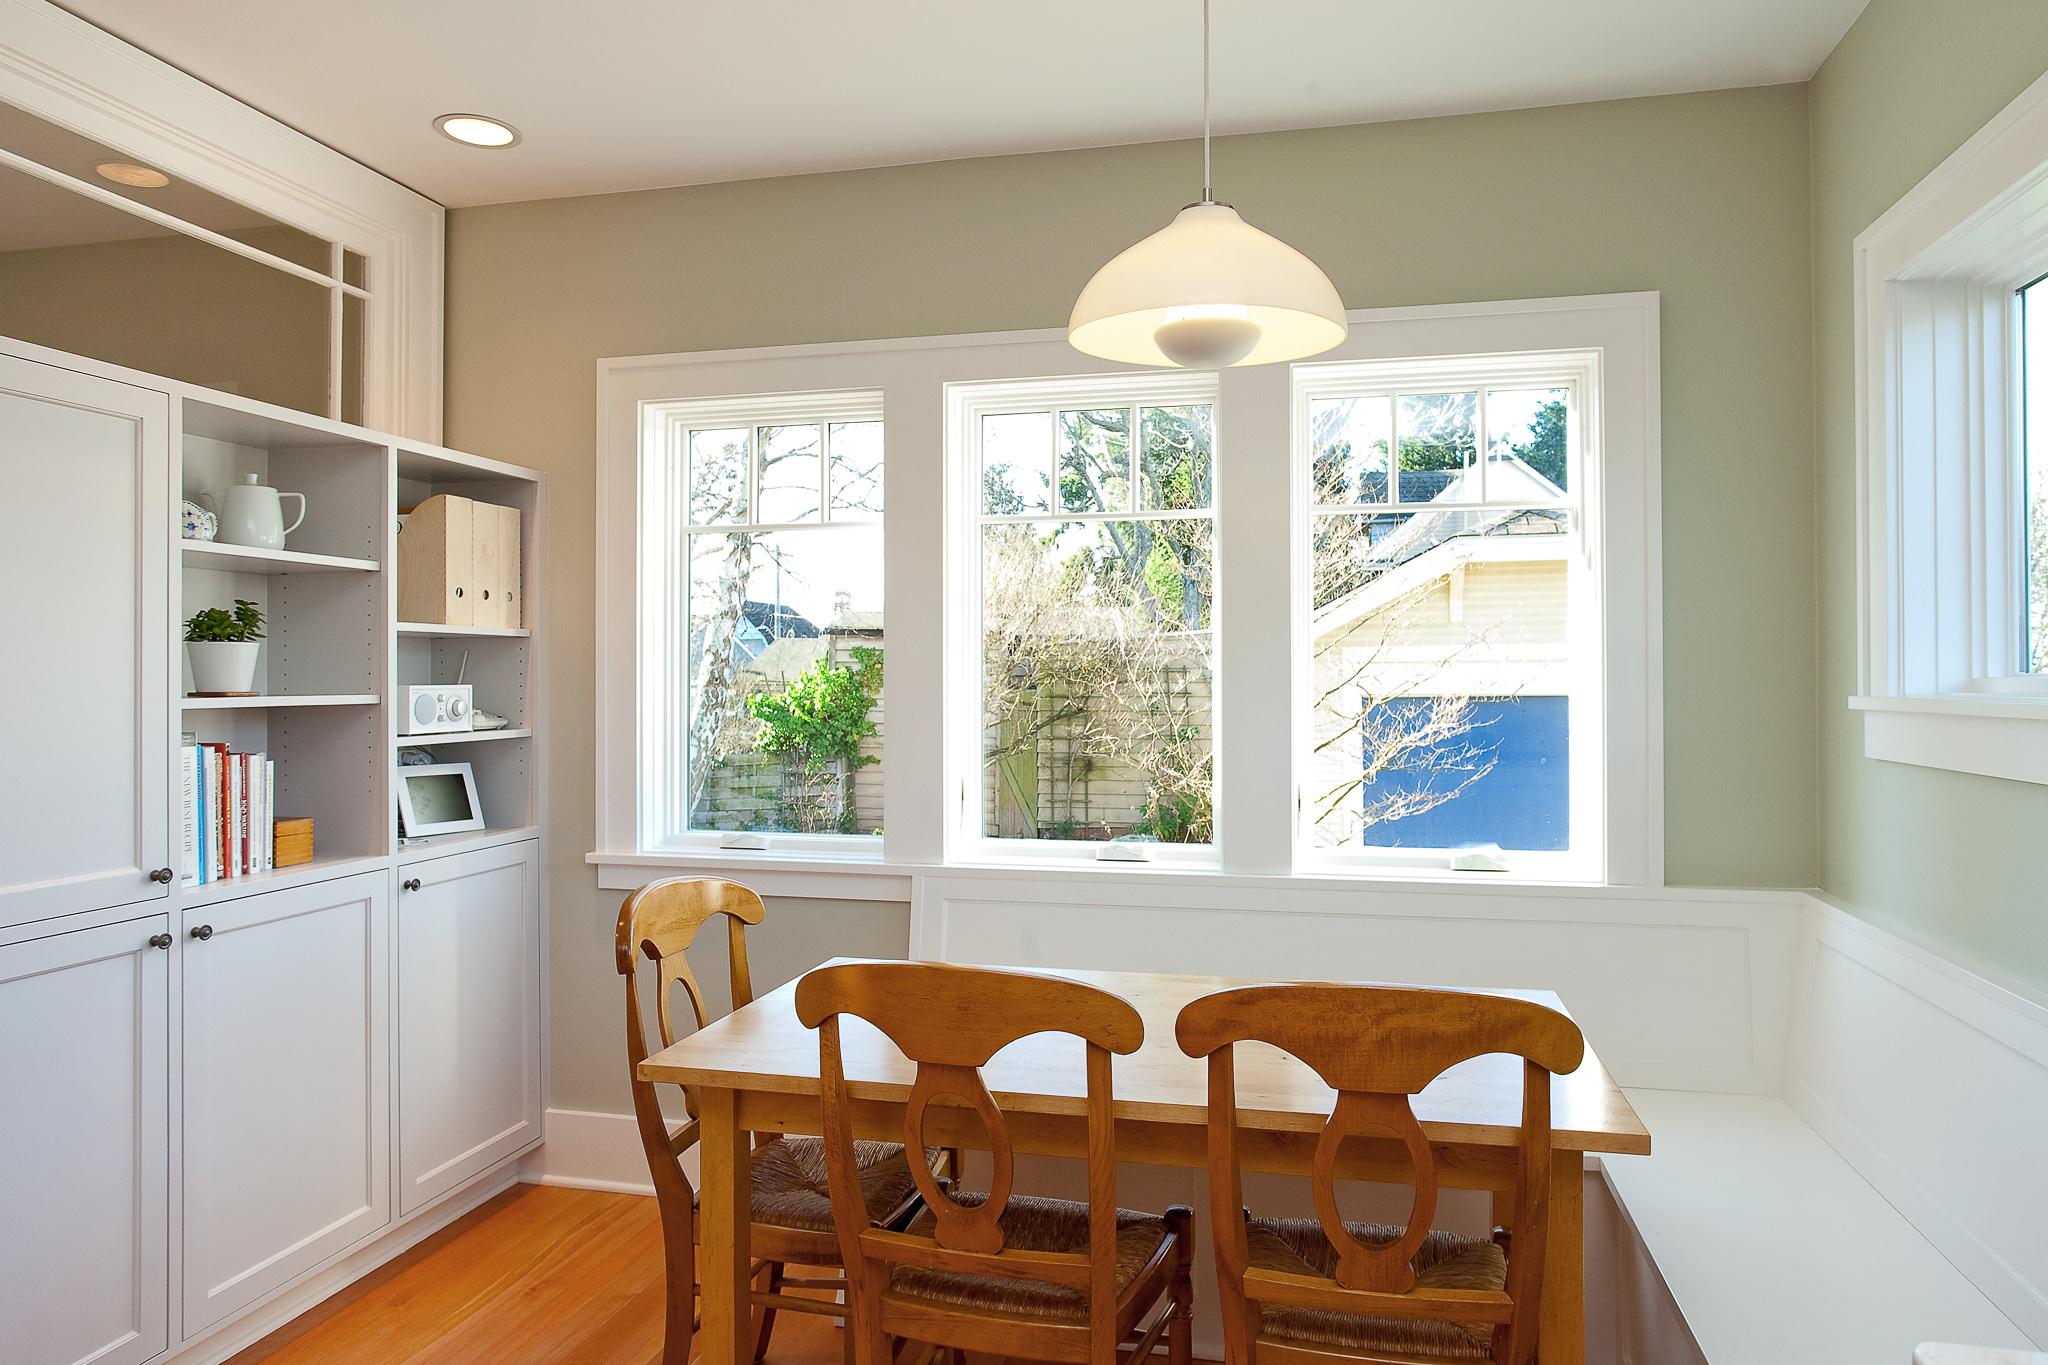 BALLARD Kitchen and Mudroom Remodel 6.jpg